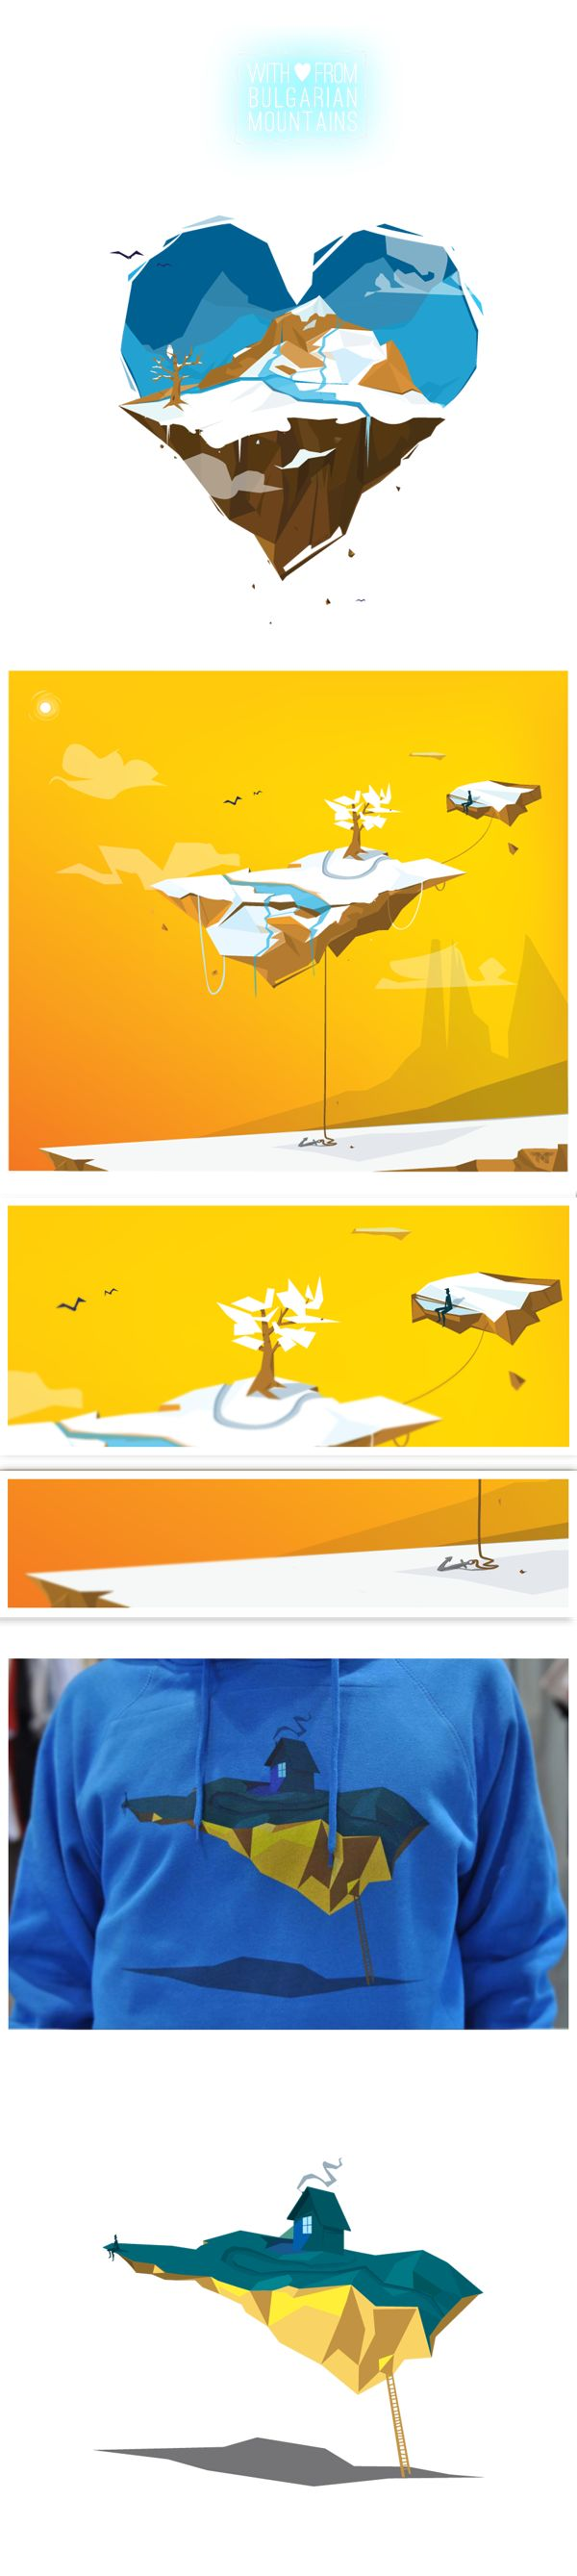 Illustration for mountains by JRMN , via Behance ван момент флат лоуполи